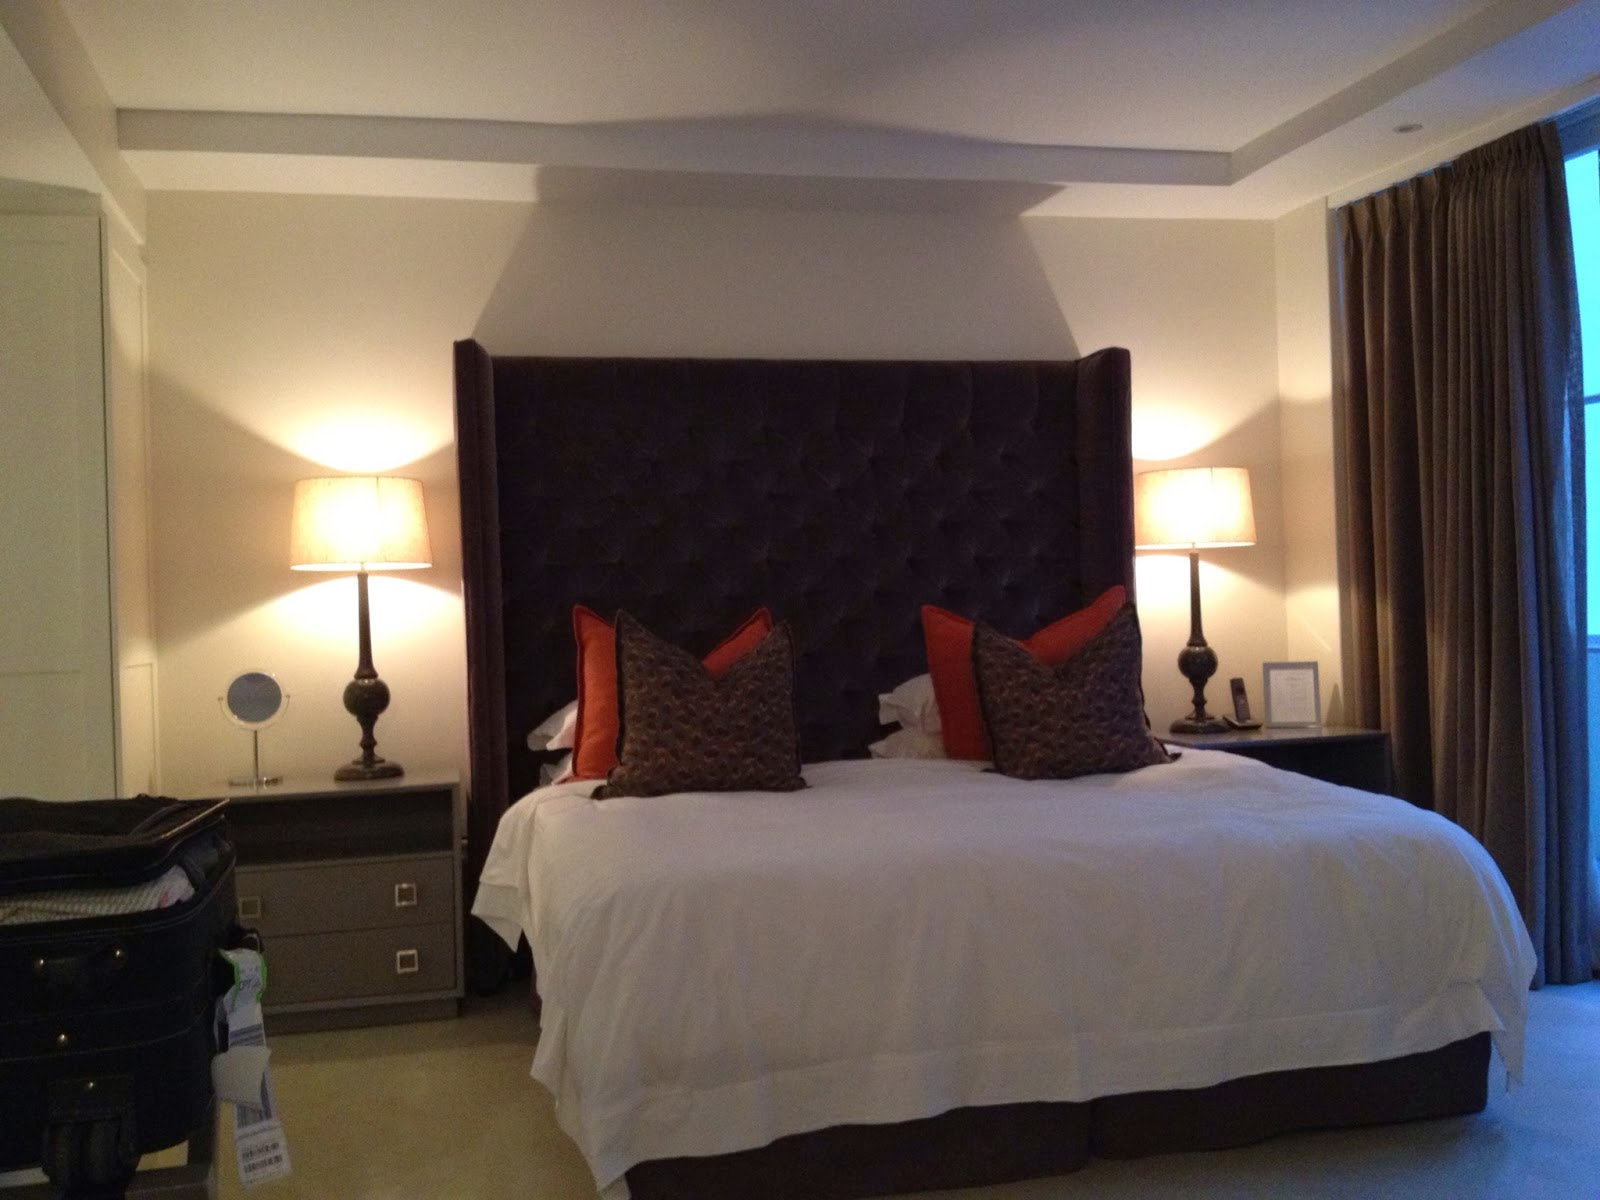 Cape Town - Bedroom area